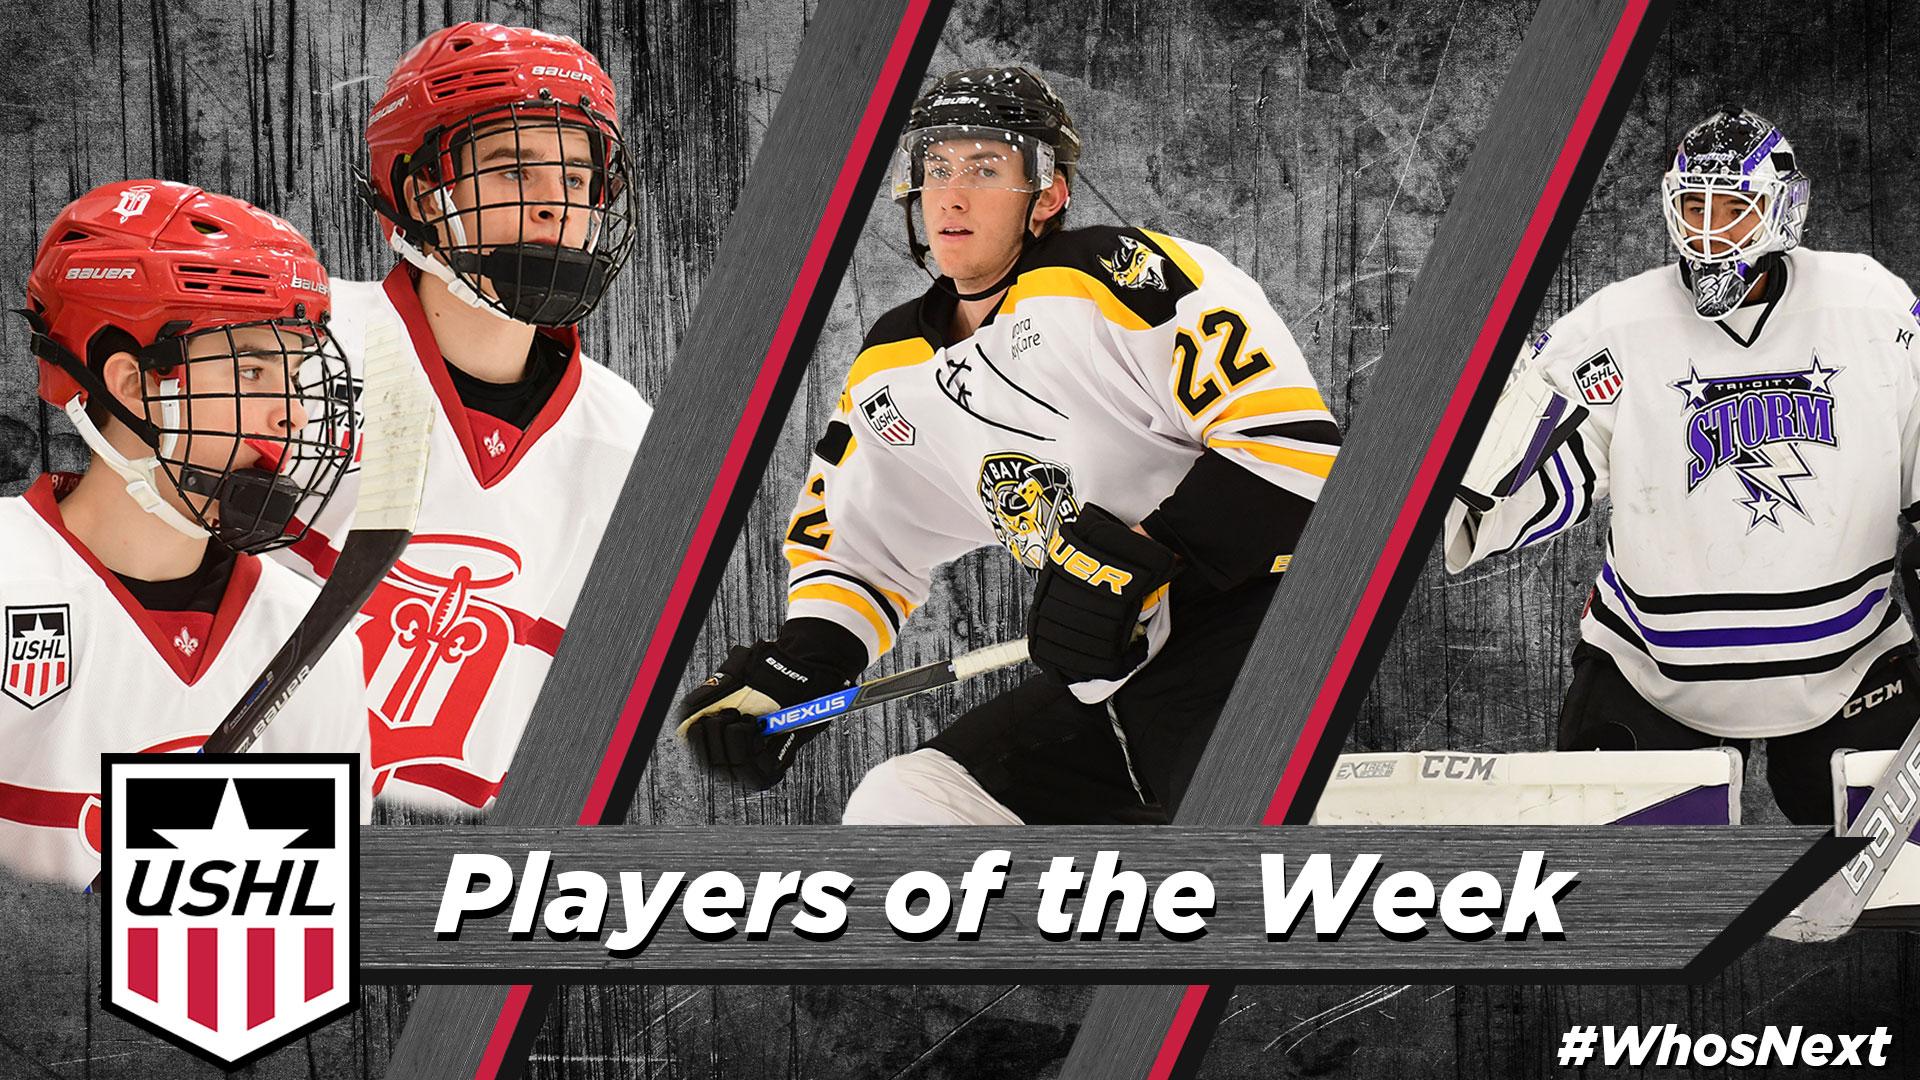 USHL: USHL Players Of The Week - Week 3